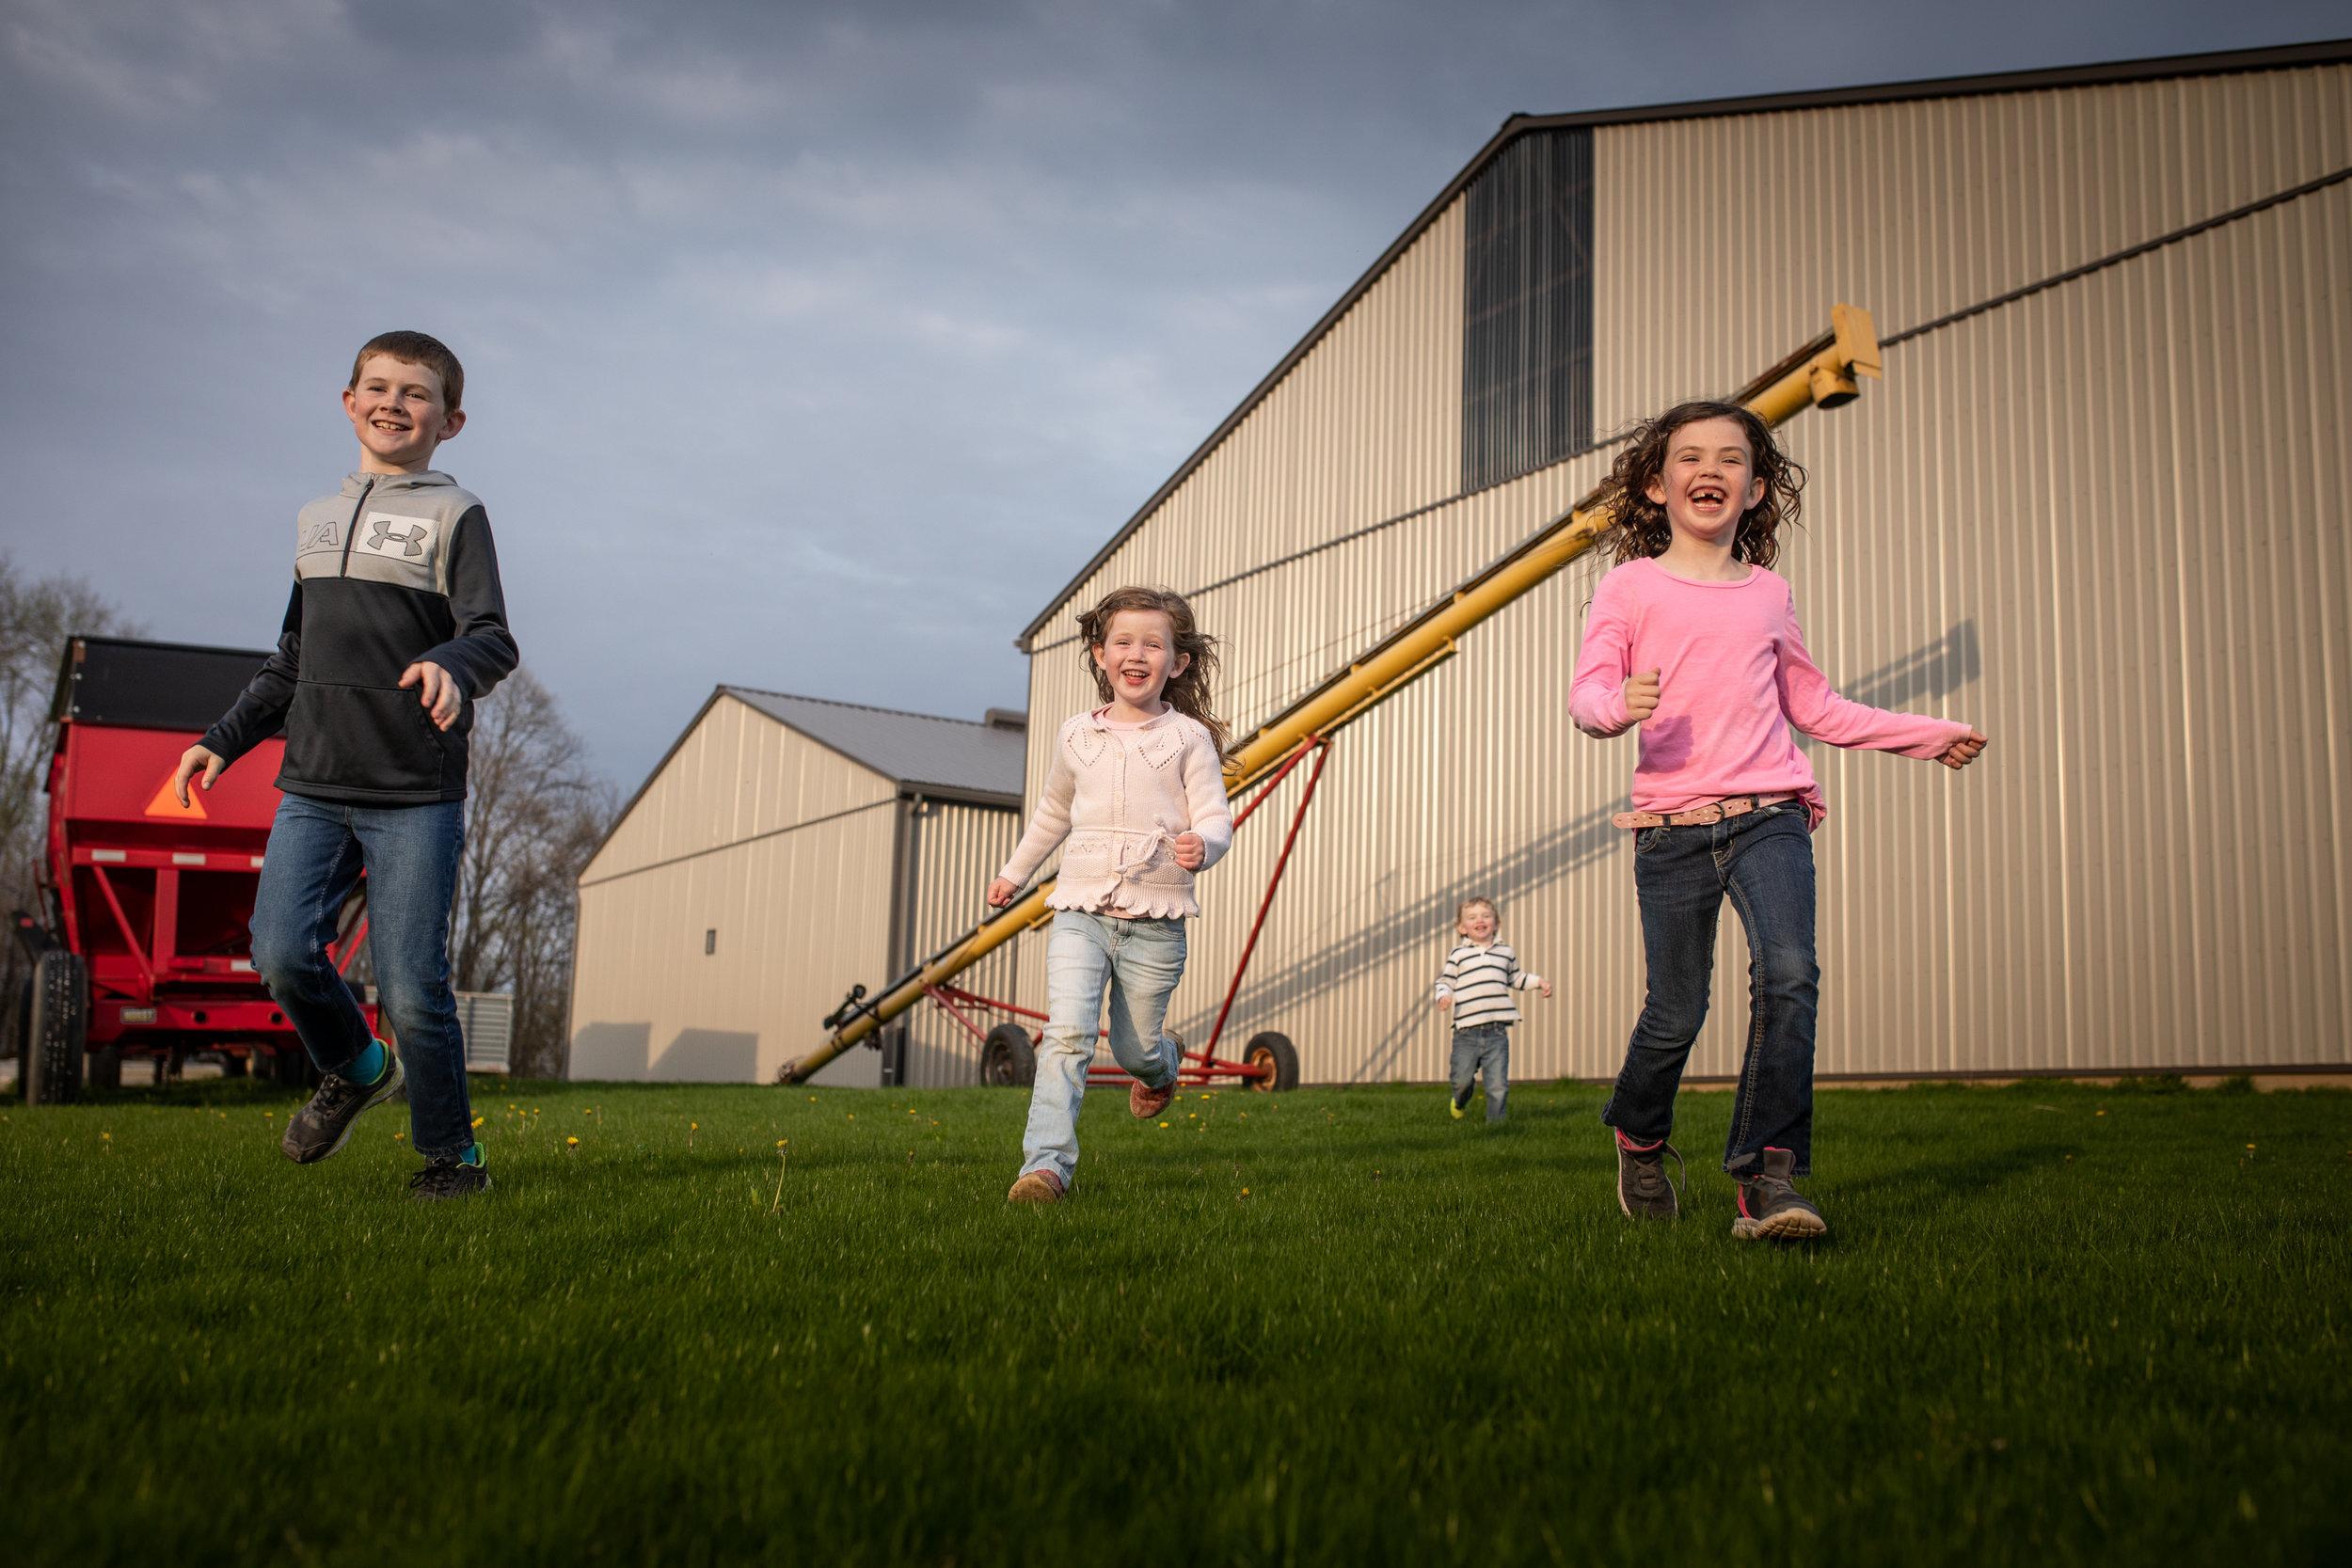 Family-Jodie-Aldred-Photography-Middlesex-london-Dutton-glencoe-ontario-chatham-huron-lambton-elgin-agricultural-photographer-farm-kids.jpg